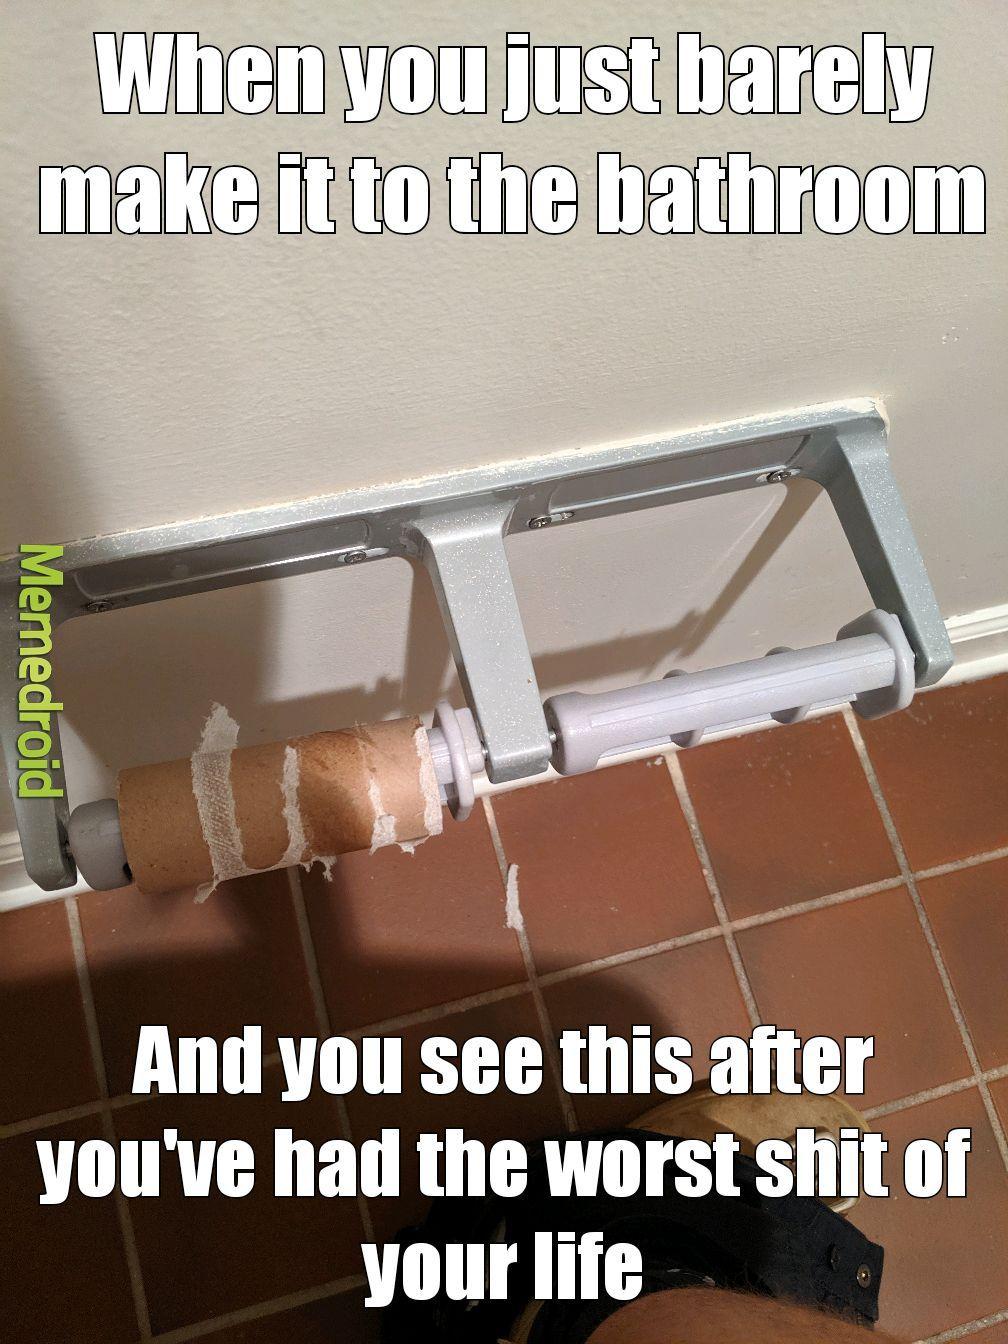 Drastic times call for drastic measures - meme